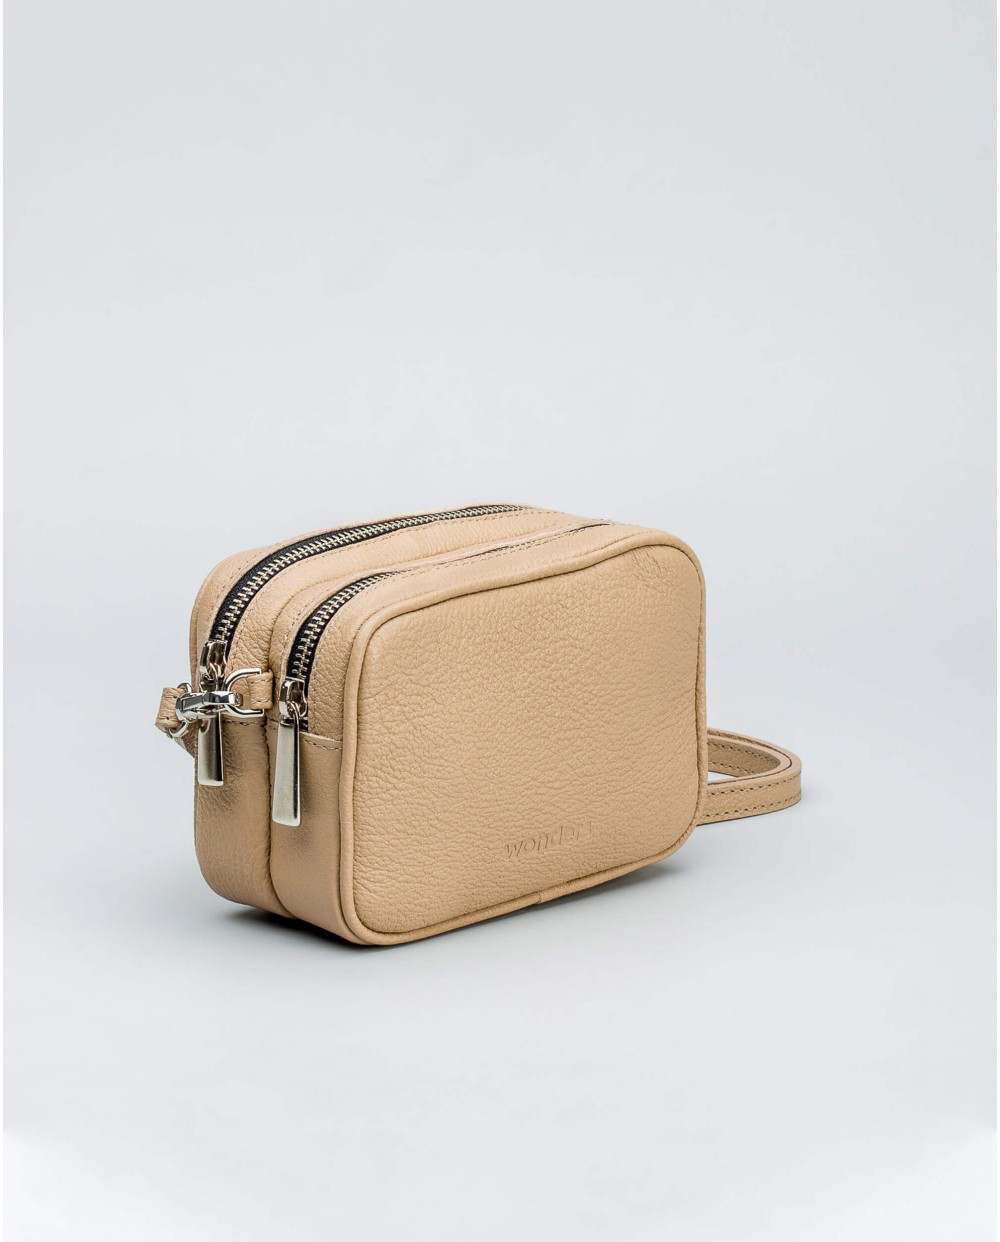 Mini handbag in pebble leather